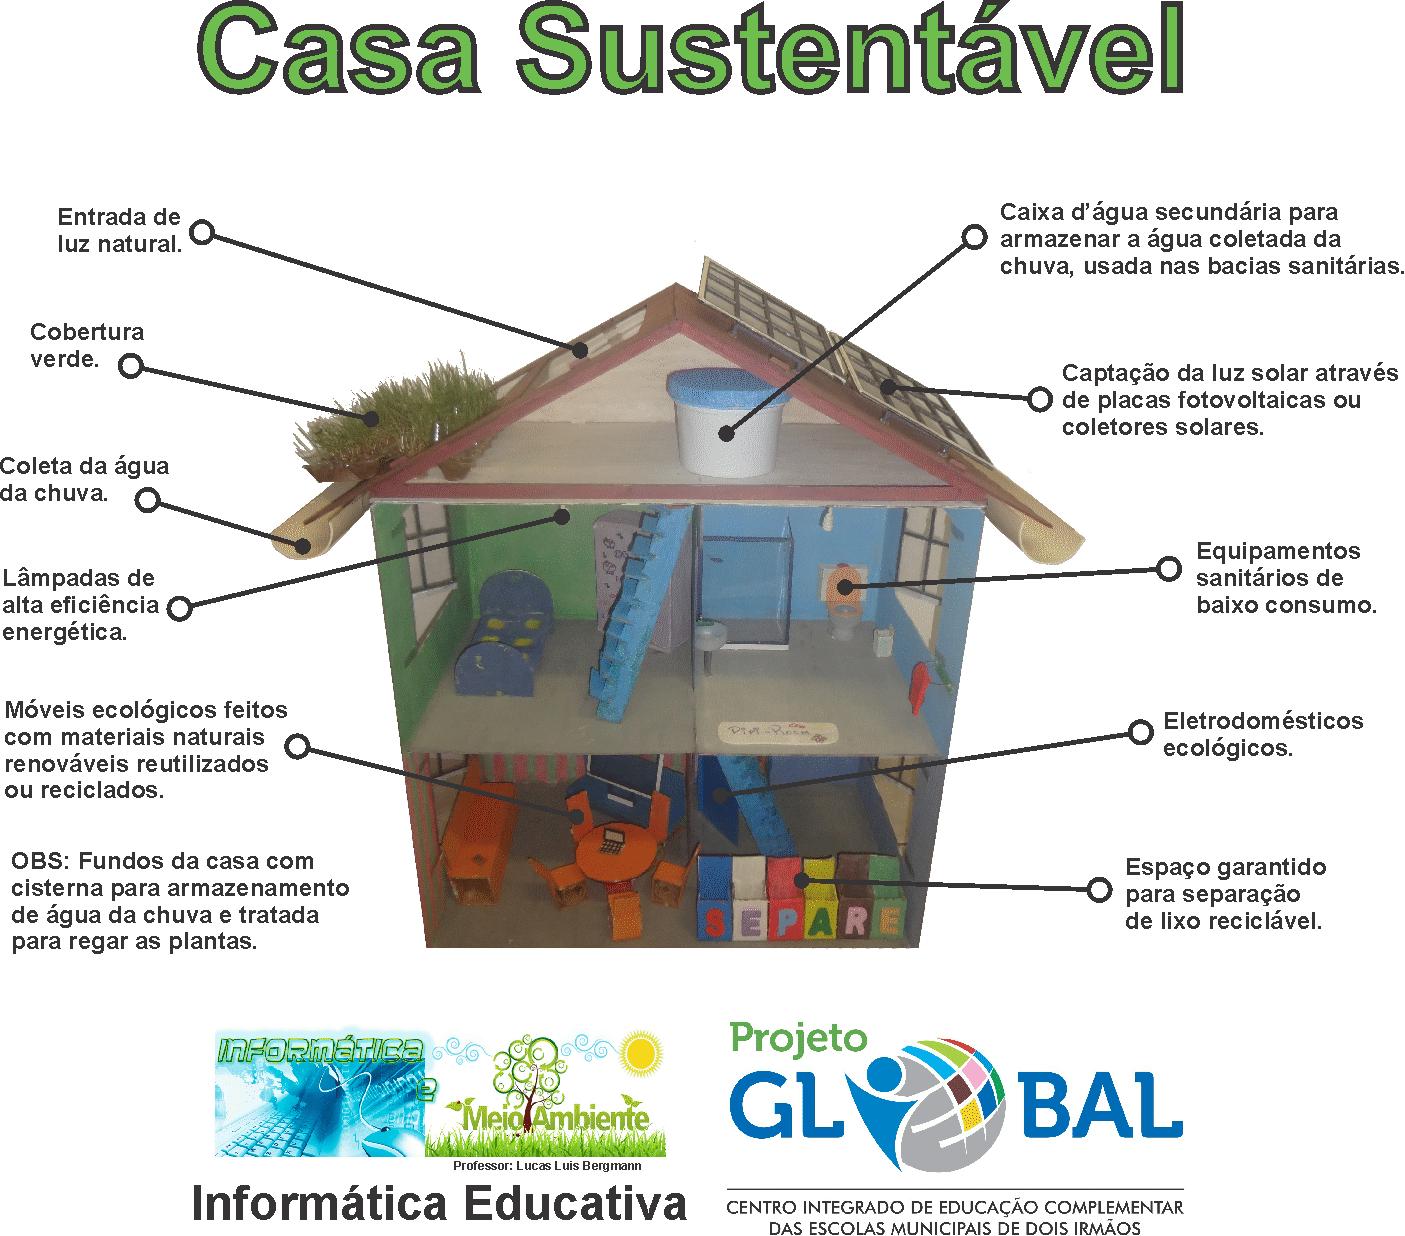 #0B7BBA Projeto Global: Informática Educativa 1405x1236 px projeto de banheiro sustentavel